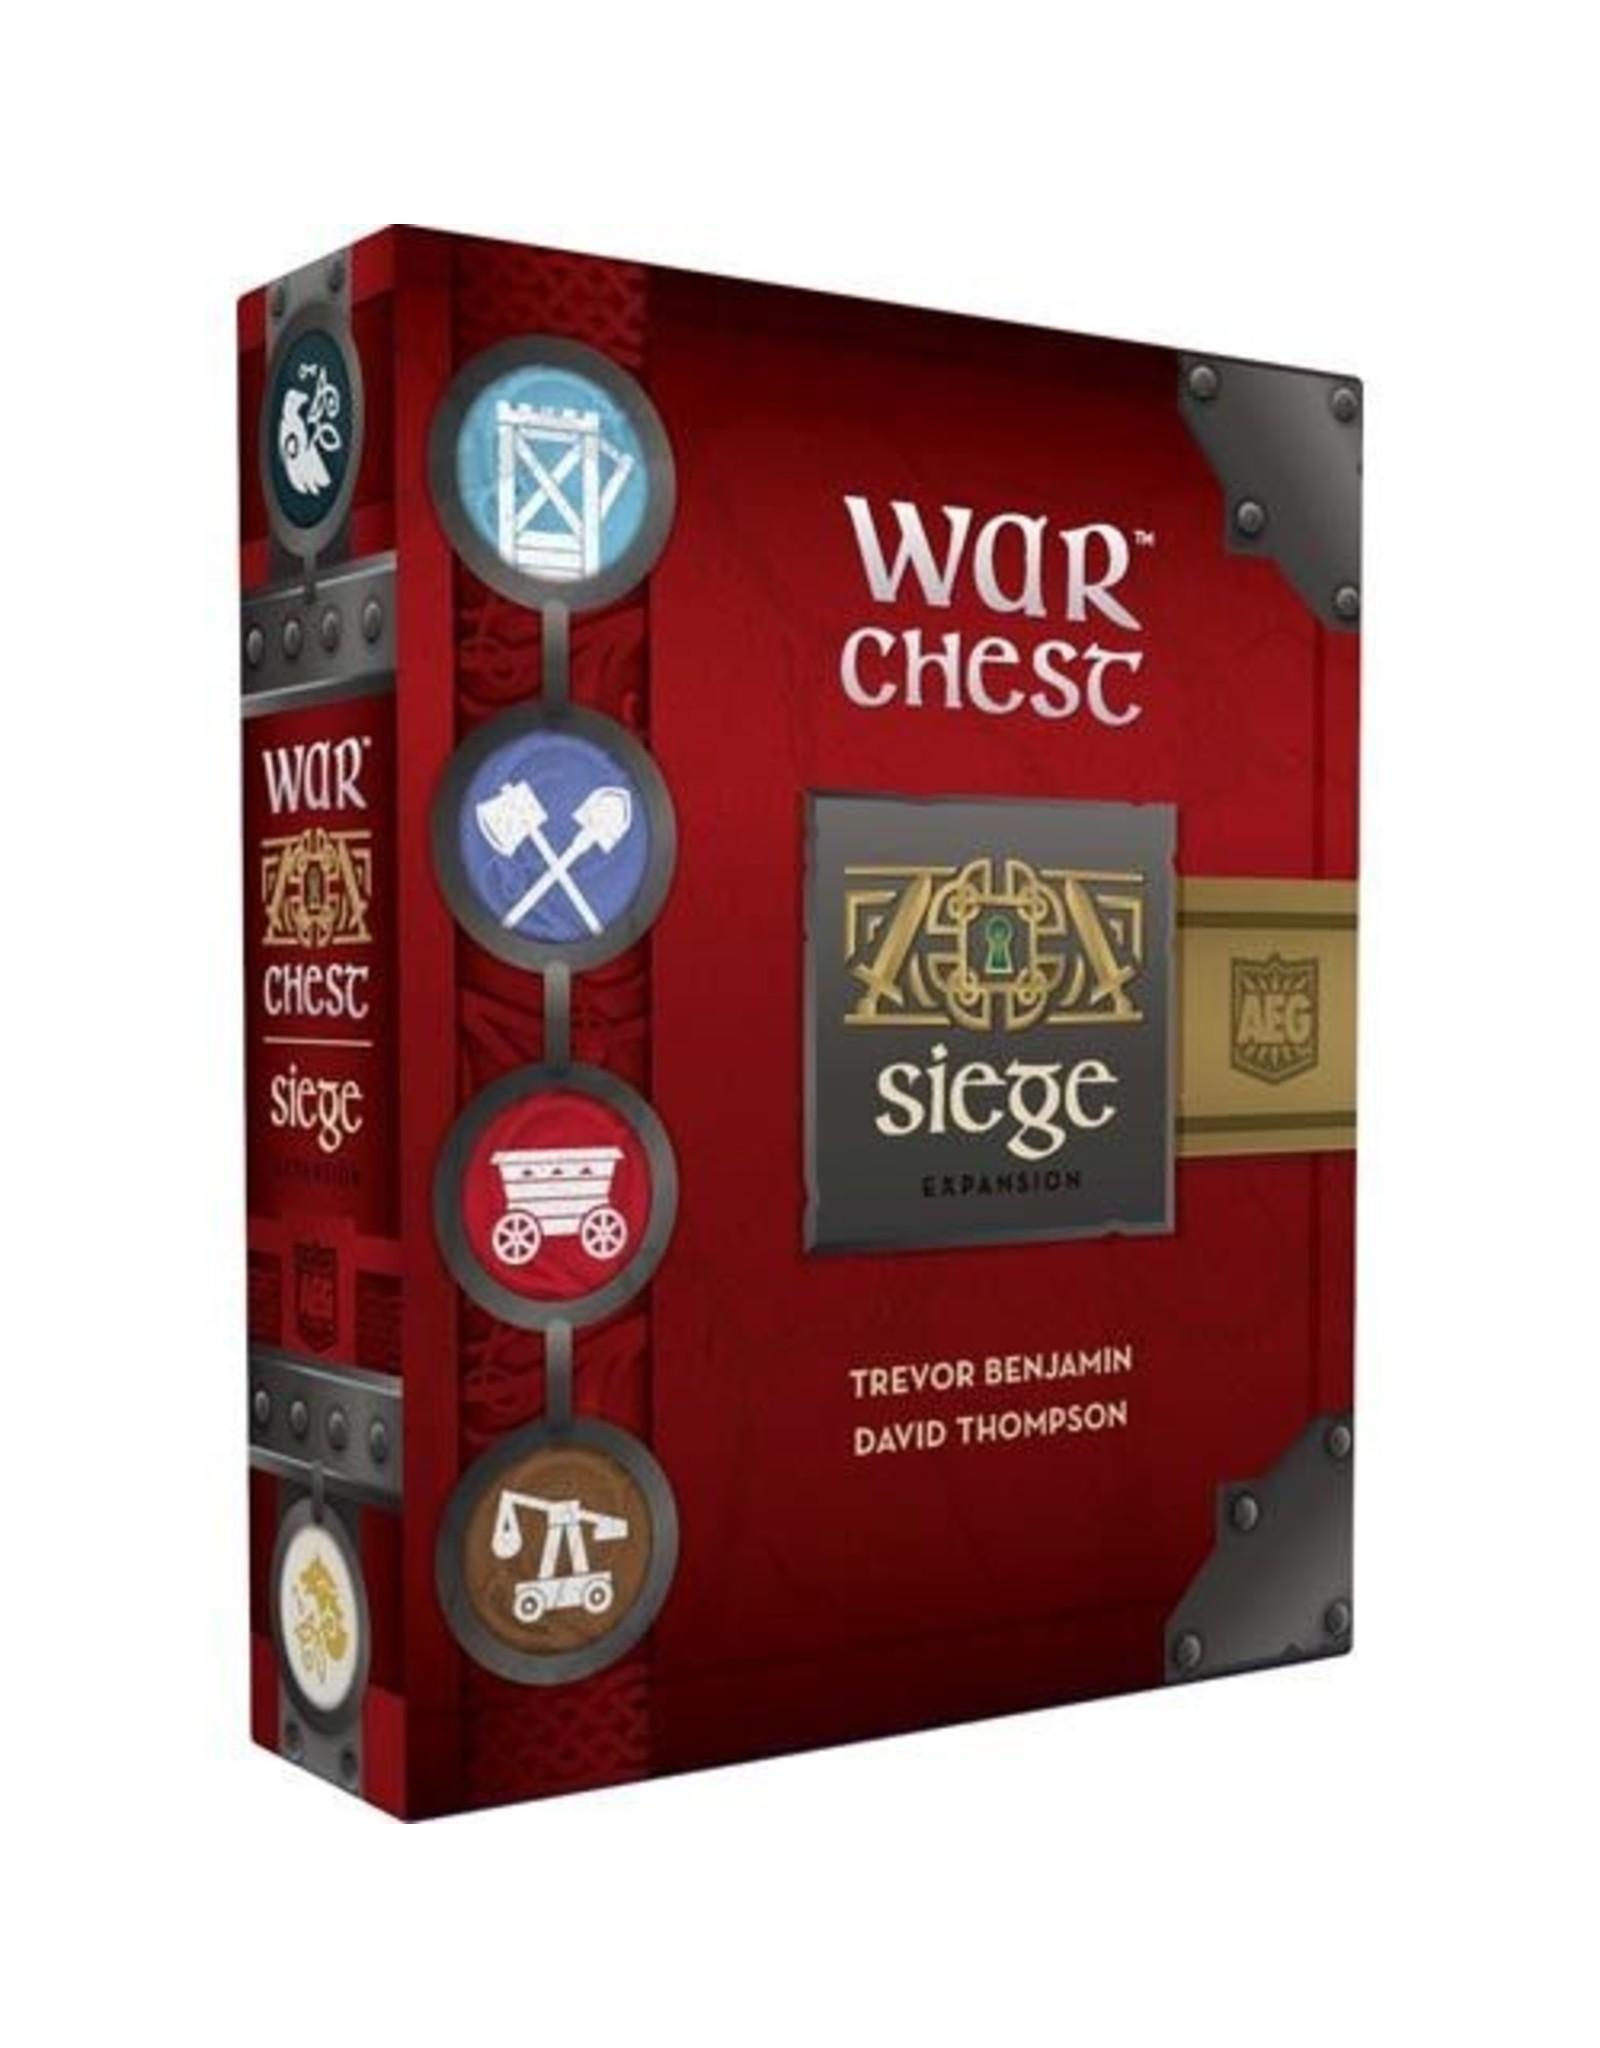 AEG War Chest: Siege Expansion